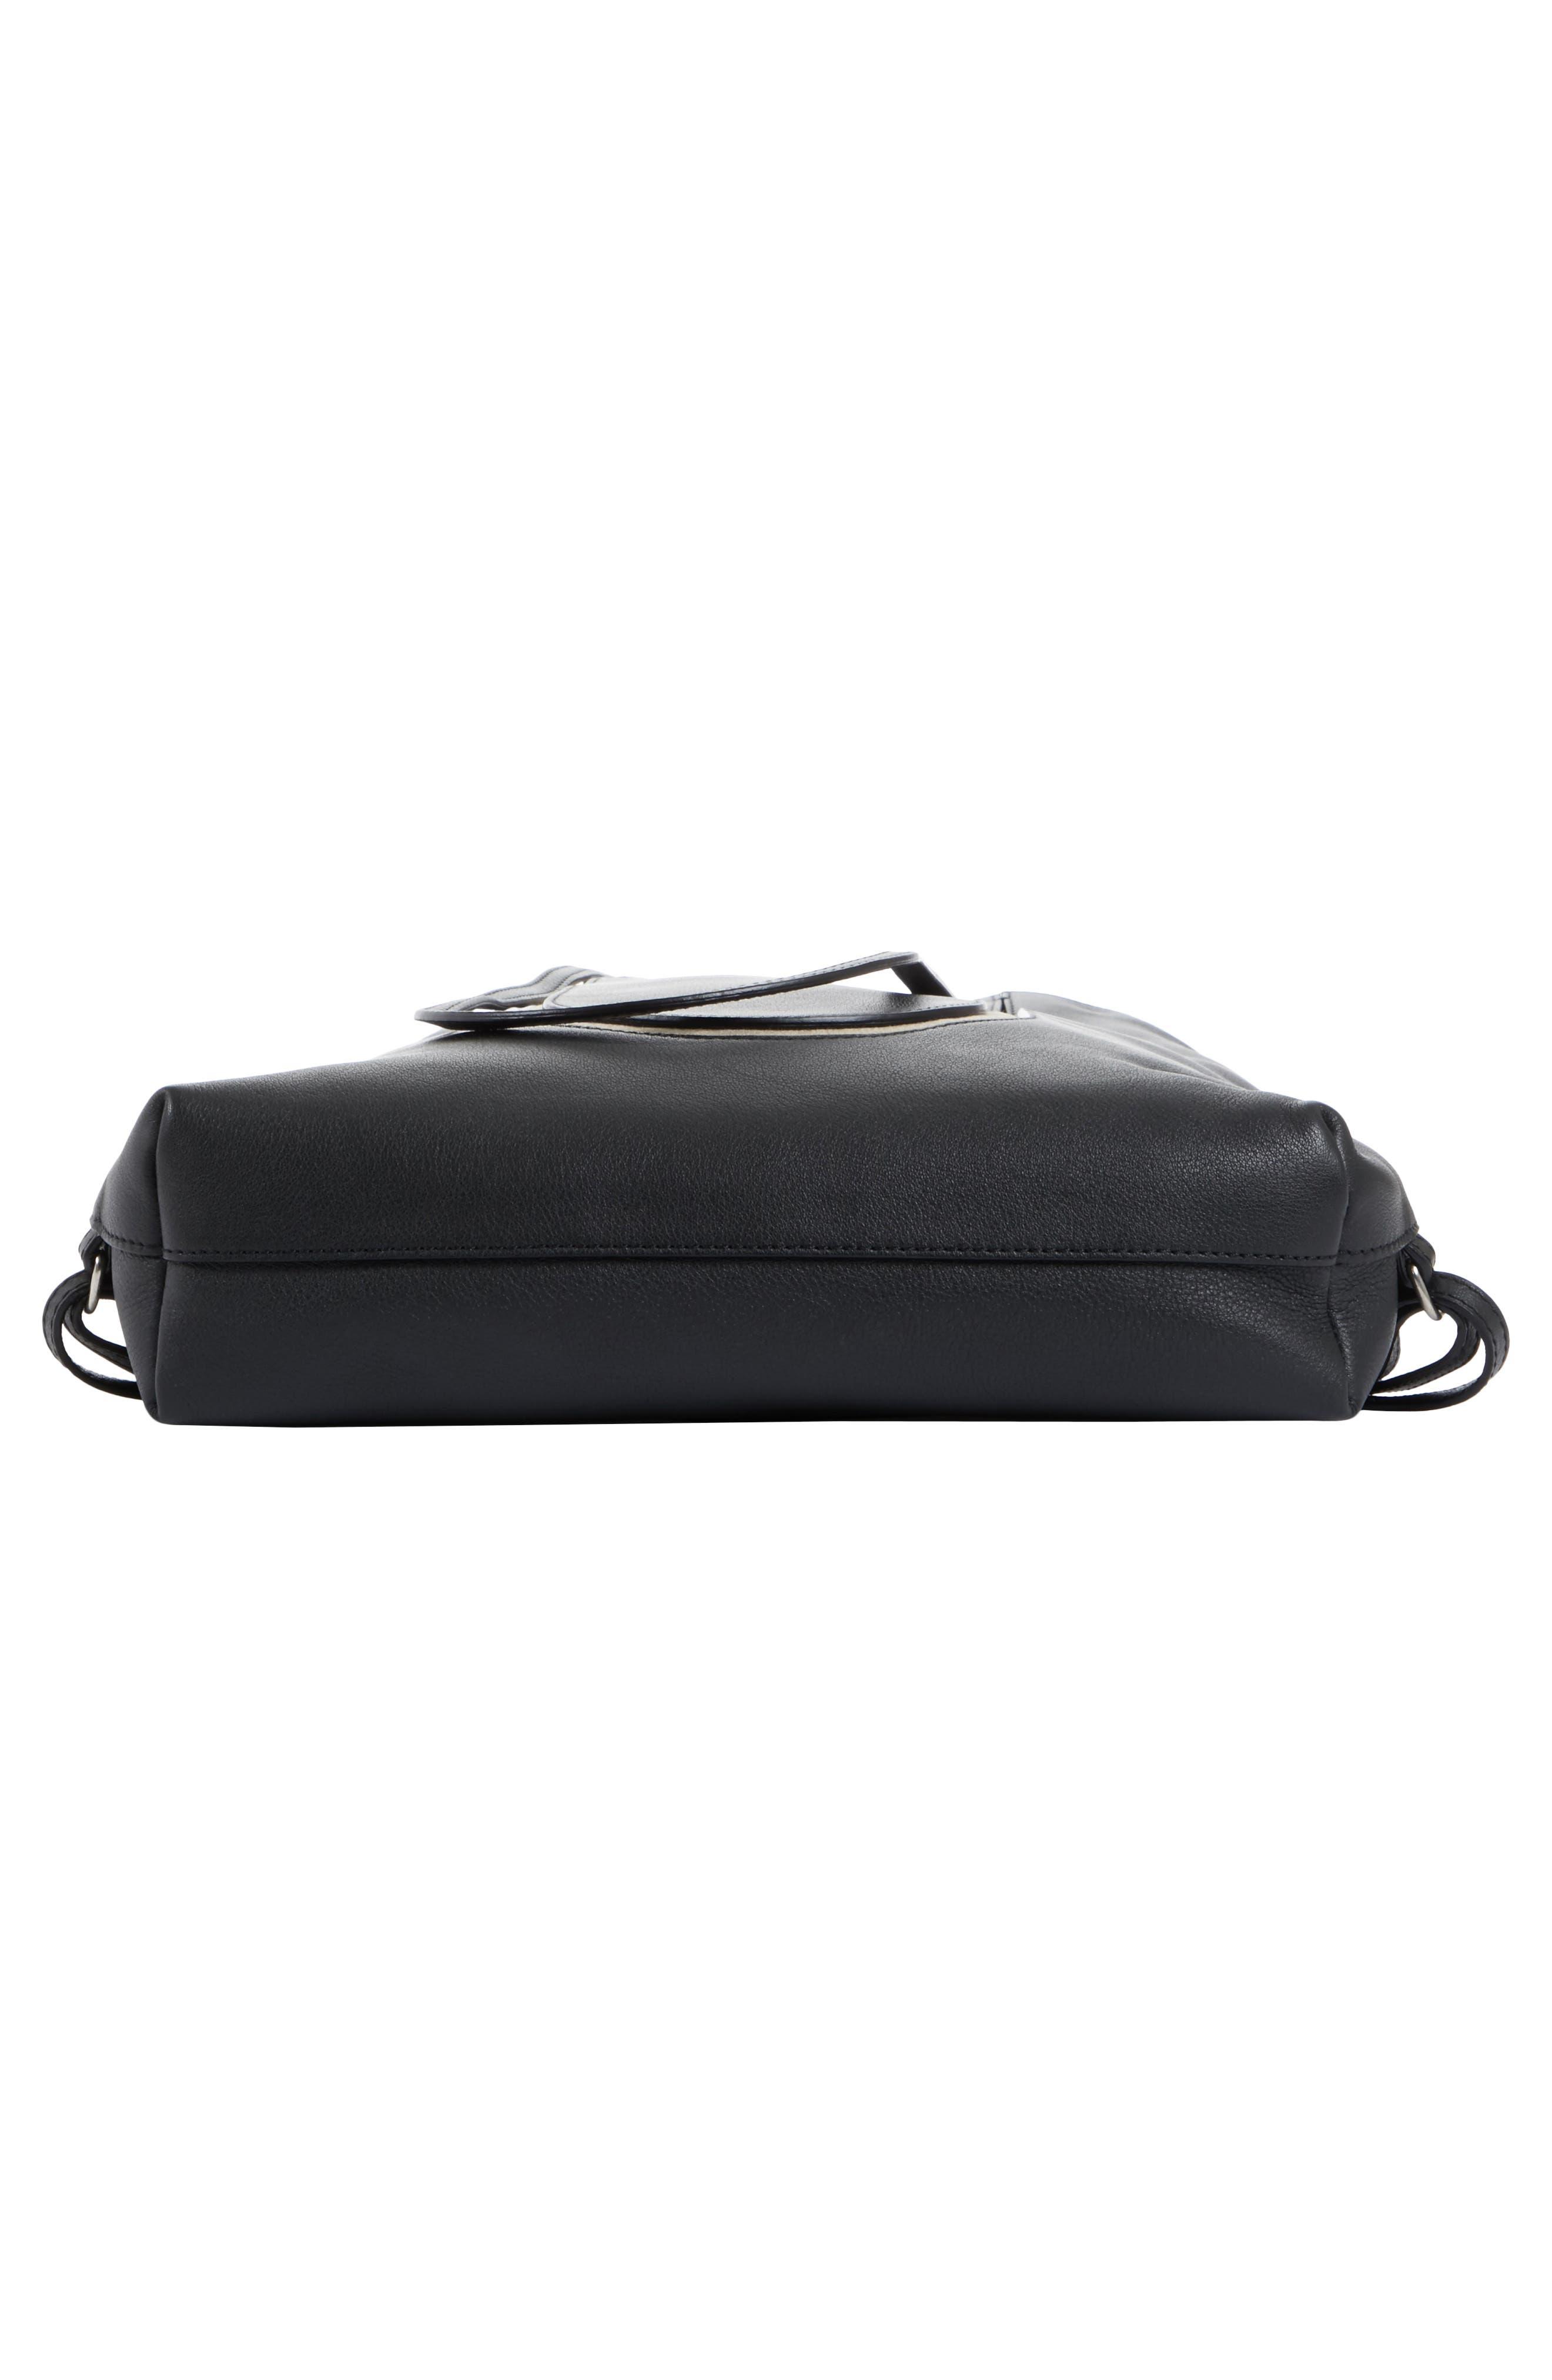 Calfskin Leather Backpack,                             Alternate thumbnail 6, color,                             Black